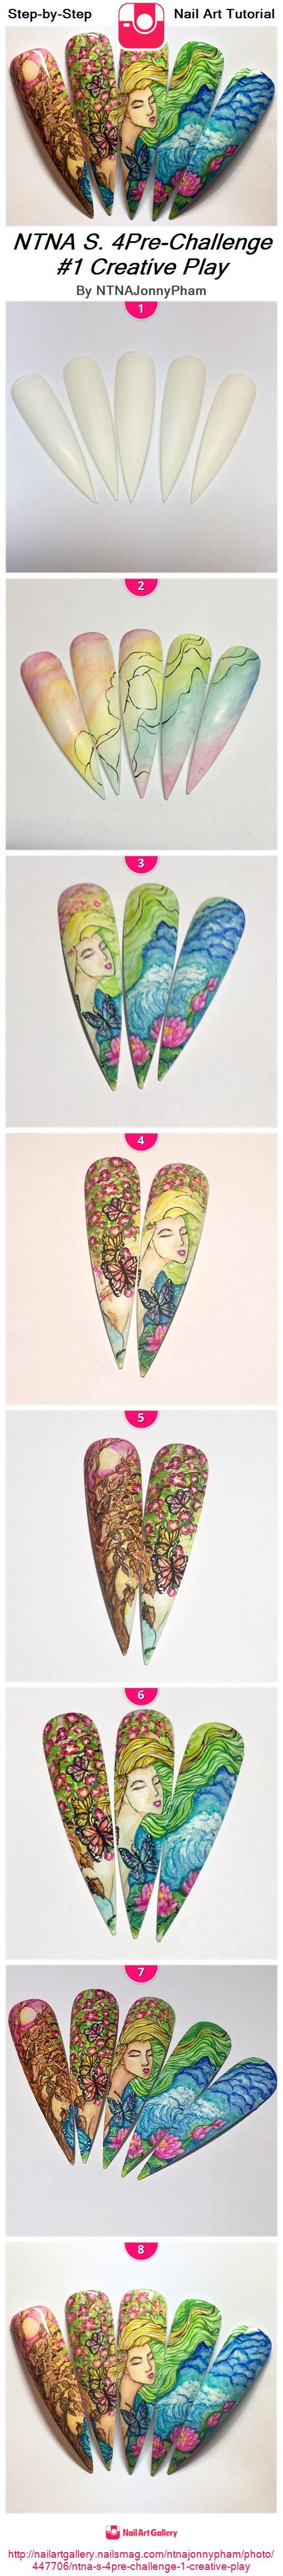 NTNA S. 4Pre-Challenge #1 Creative Play - Nail Art Gallery